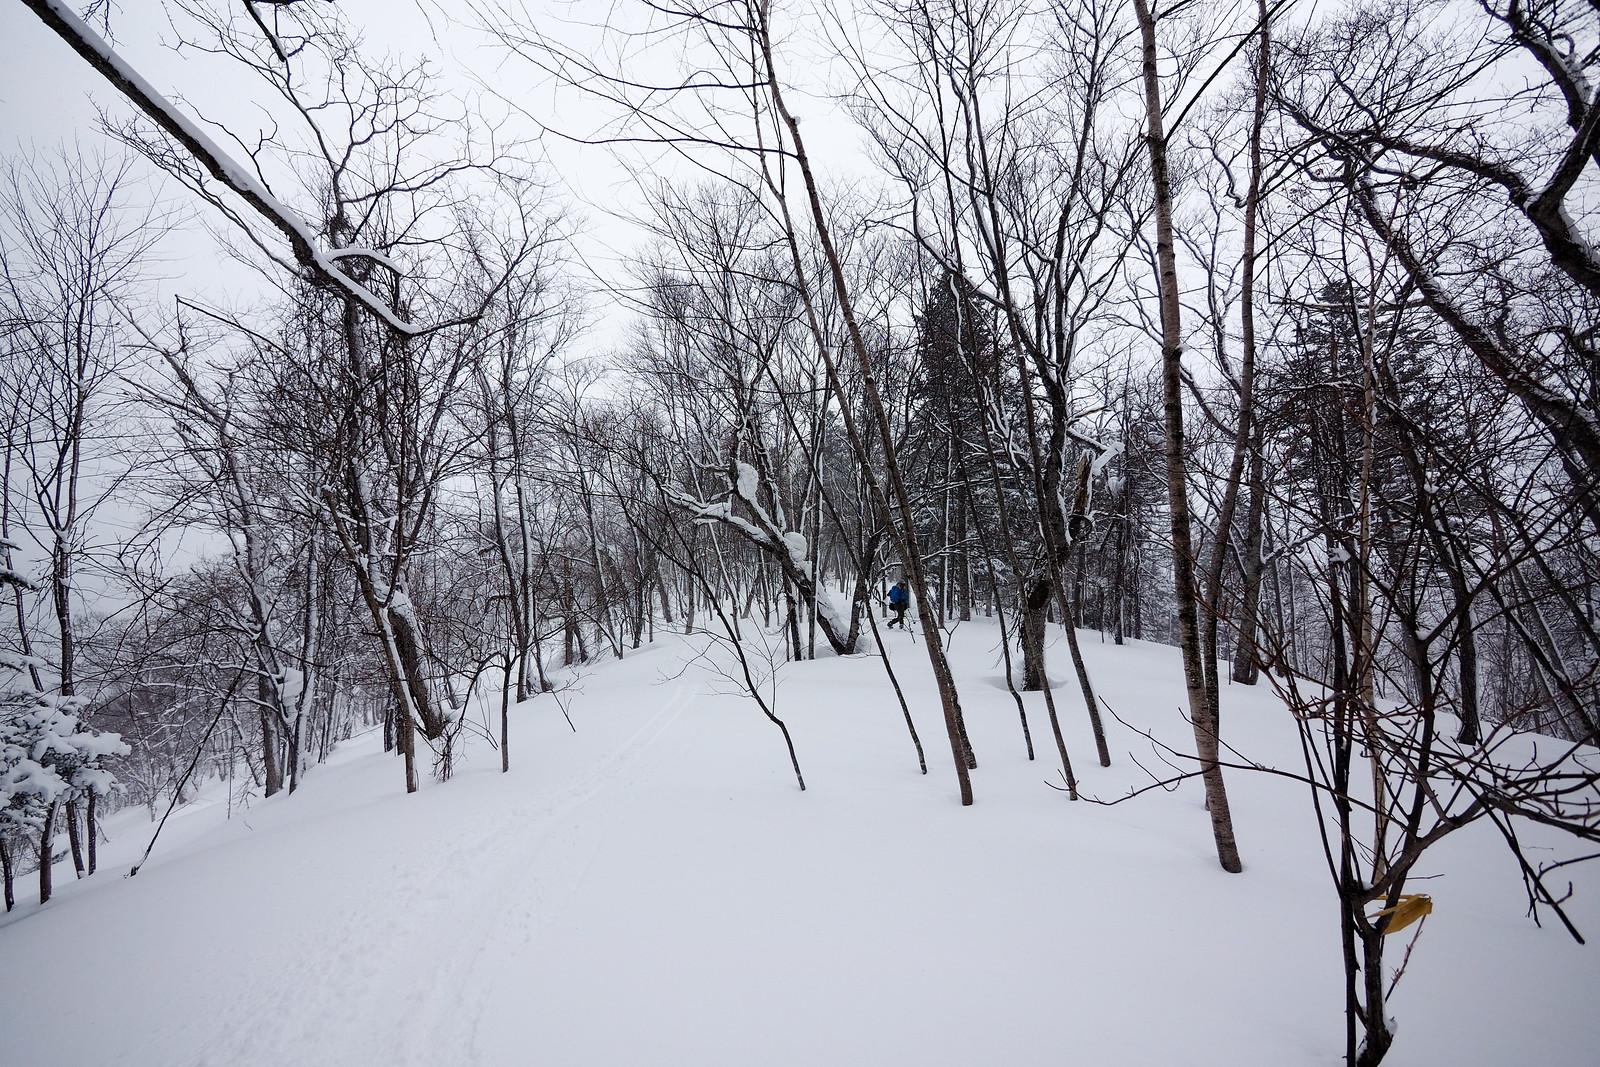 Mt. Piyashiri Ski Tour (Nayoro City, northern Hokkaido, Japan)